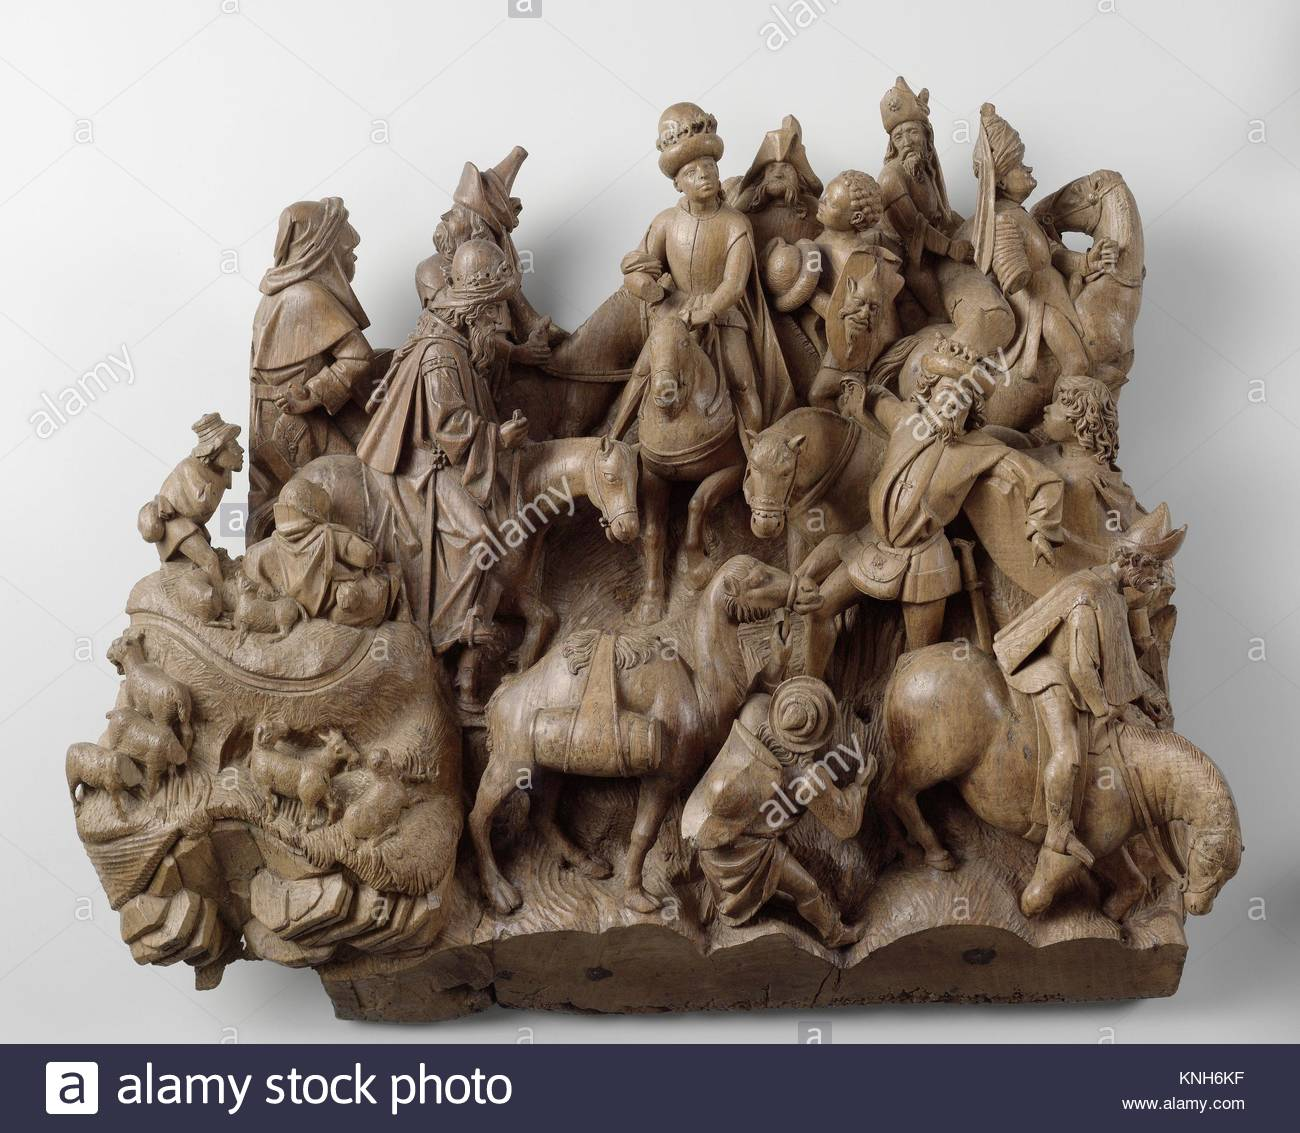 The Meeting of the Magi, Adriaen van Wesel, c. 1475 - c. 1477 - Stock Image